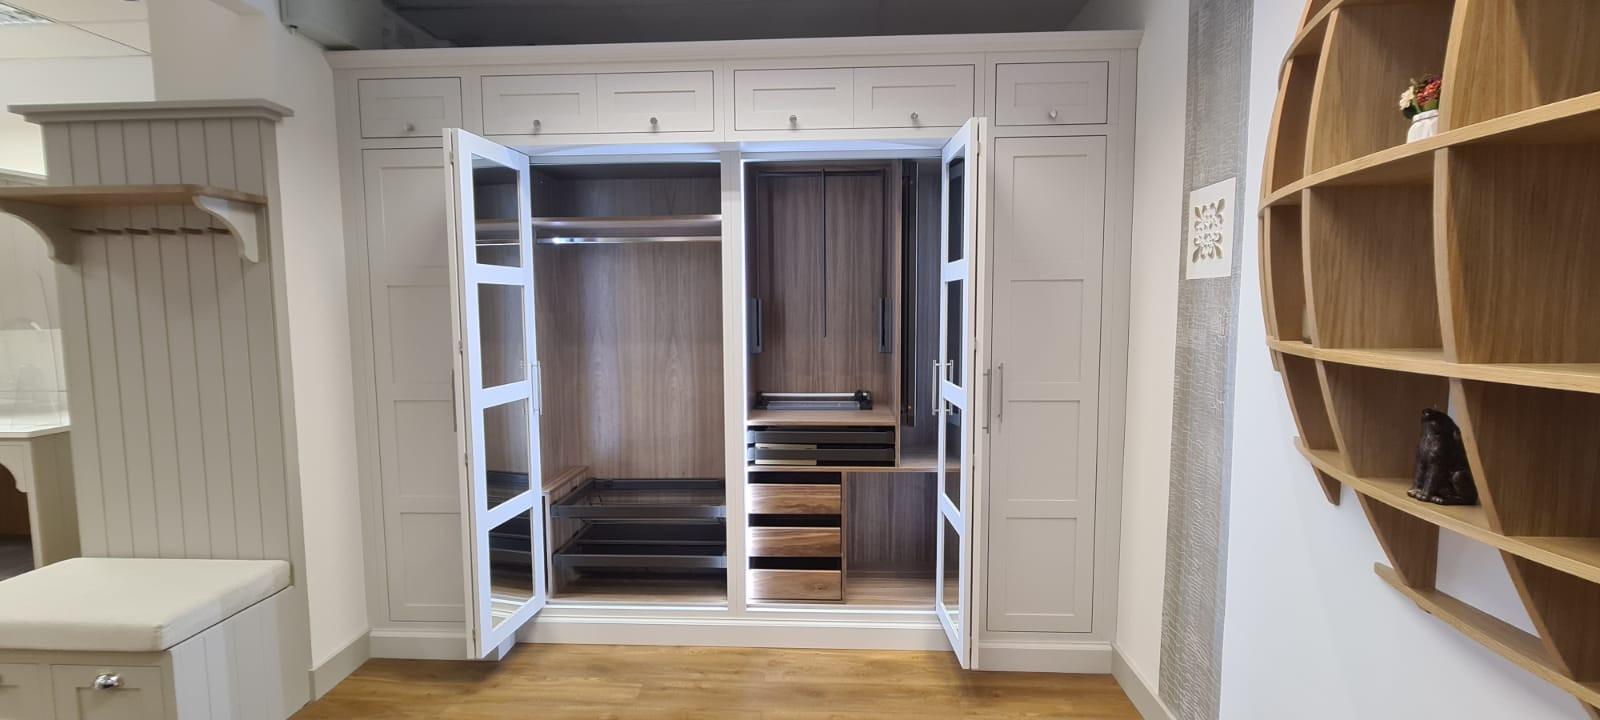 Showroom Furniture Wardrobe